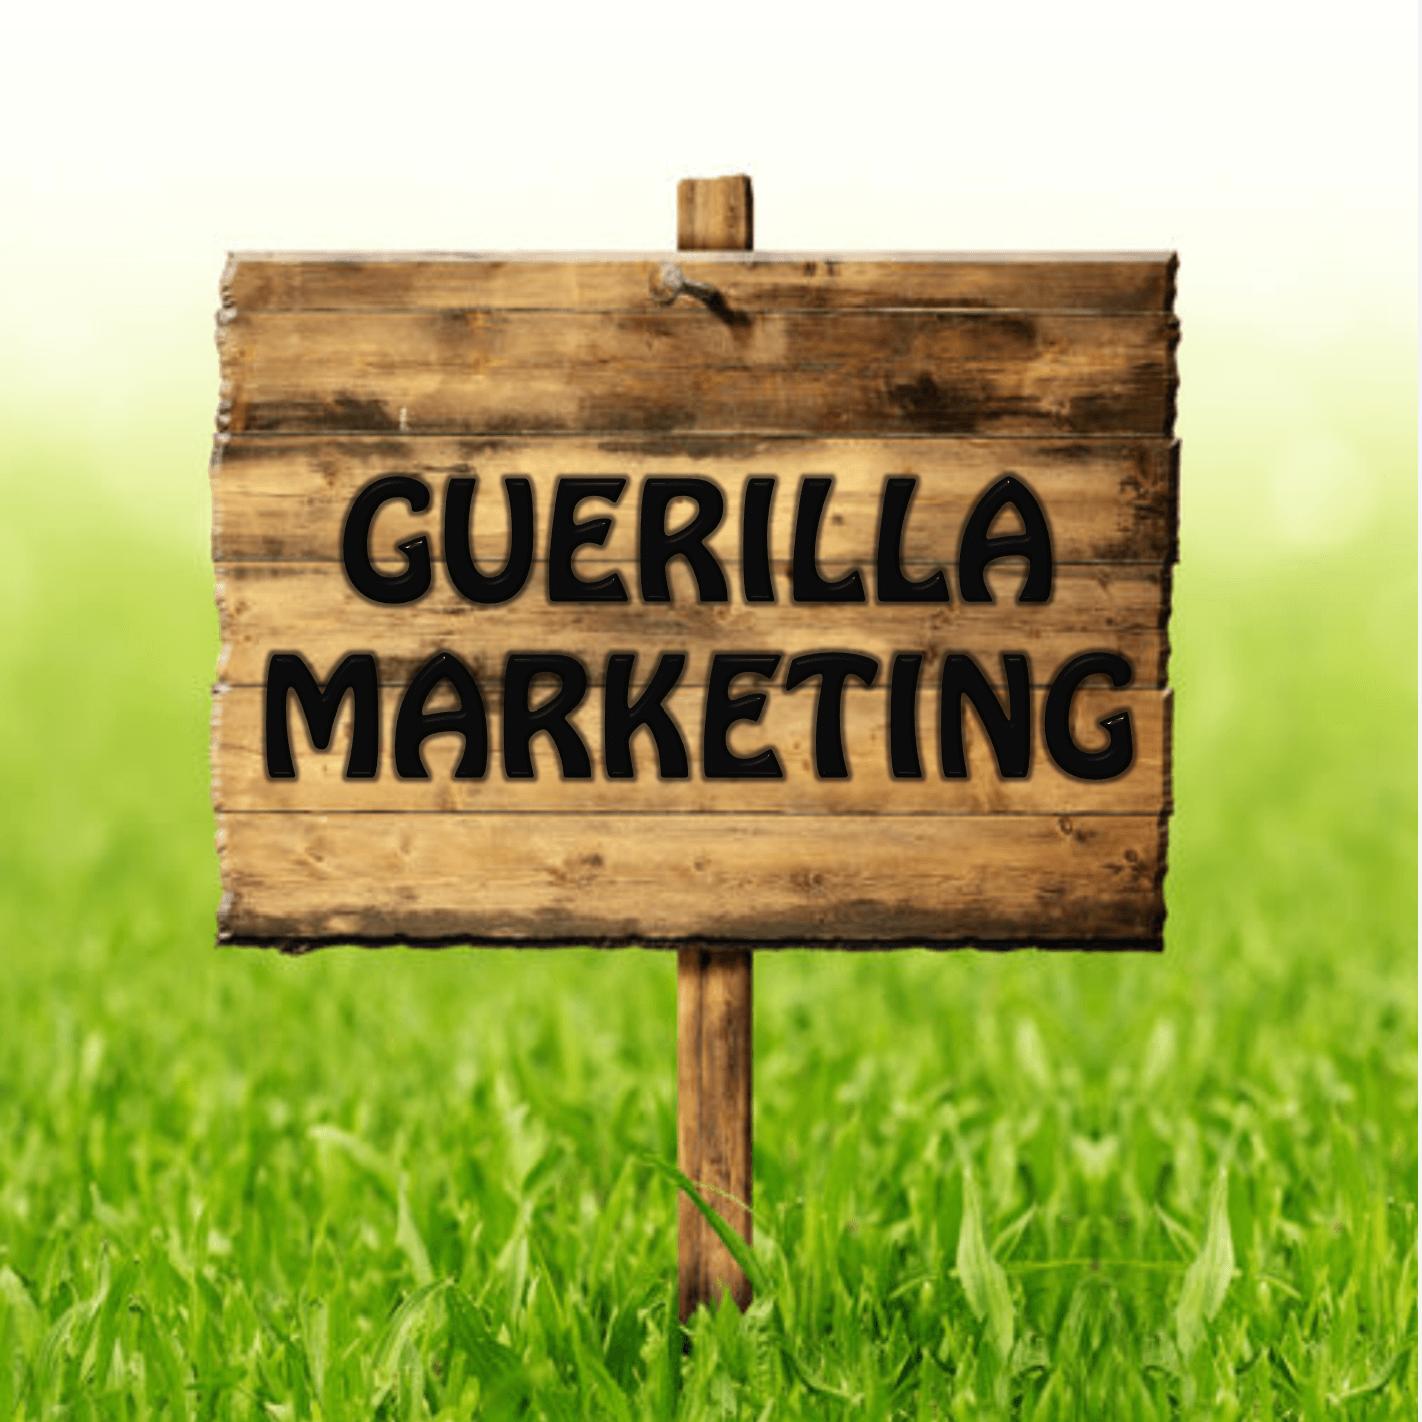 Guerilla Marketing dating sites Dating Divas april Fools